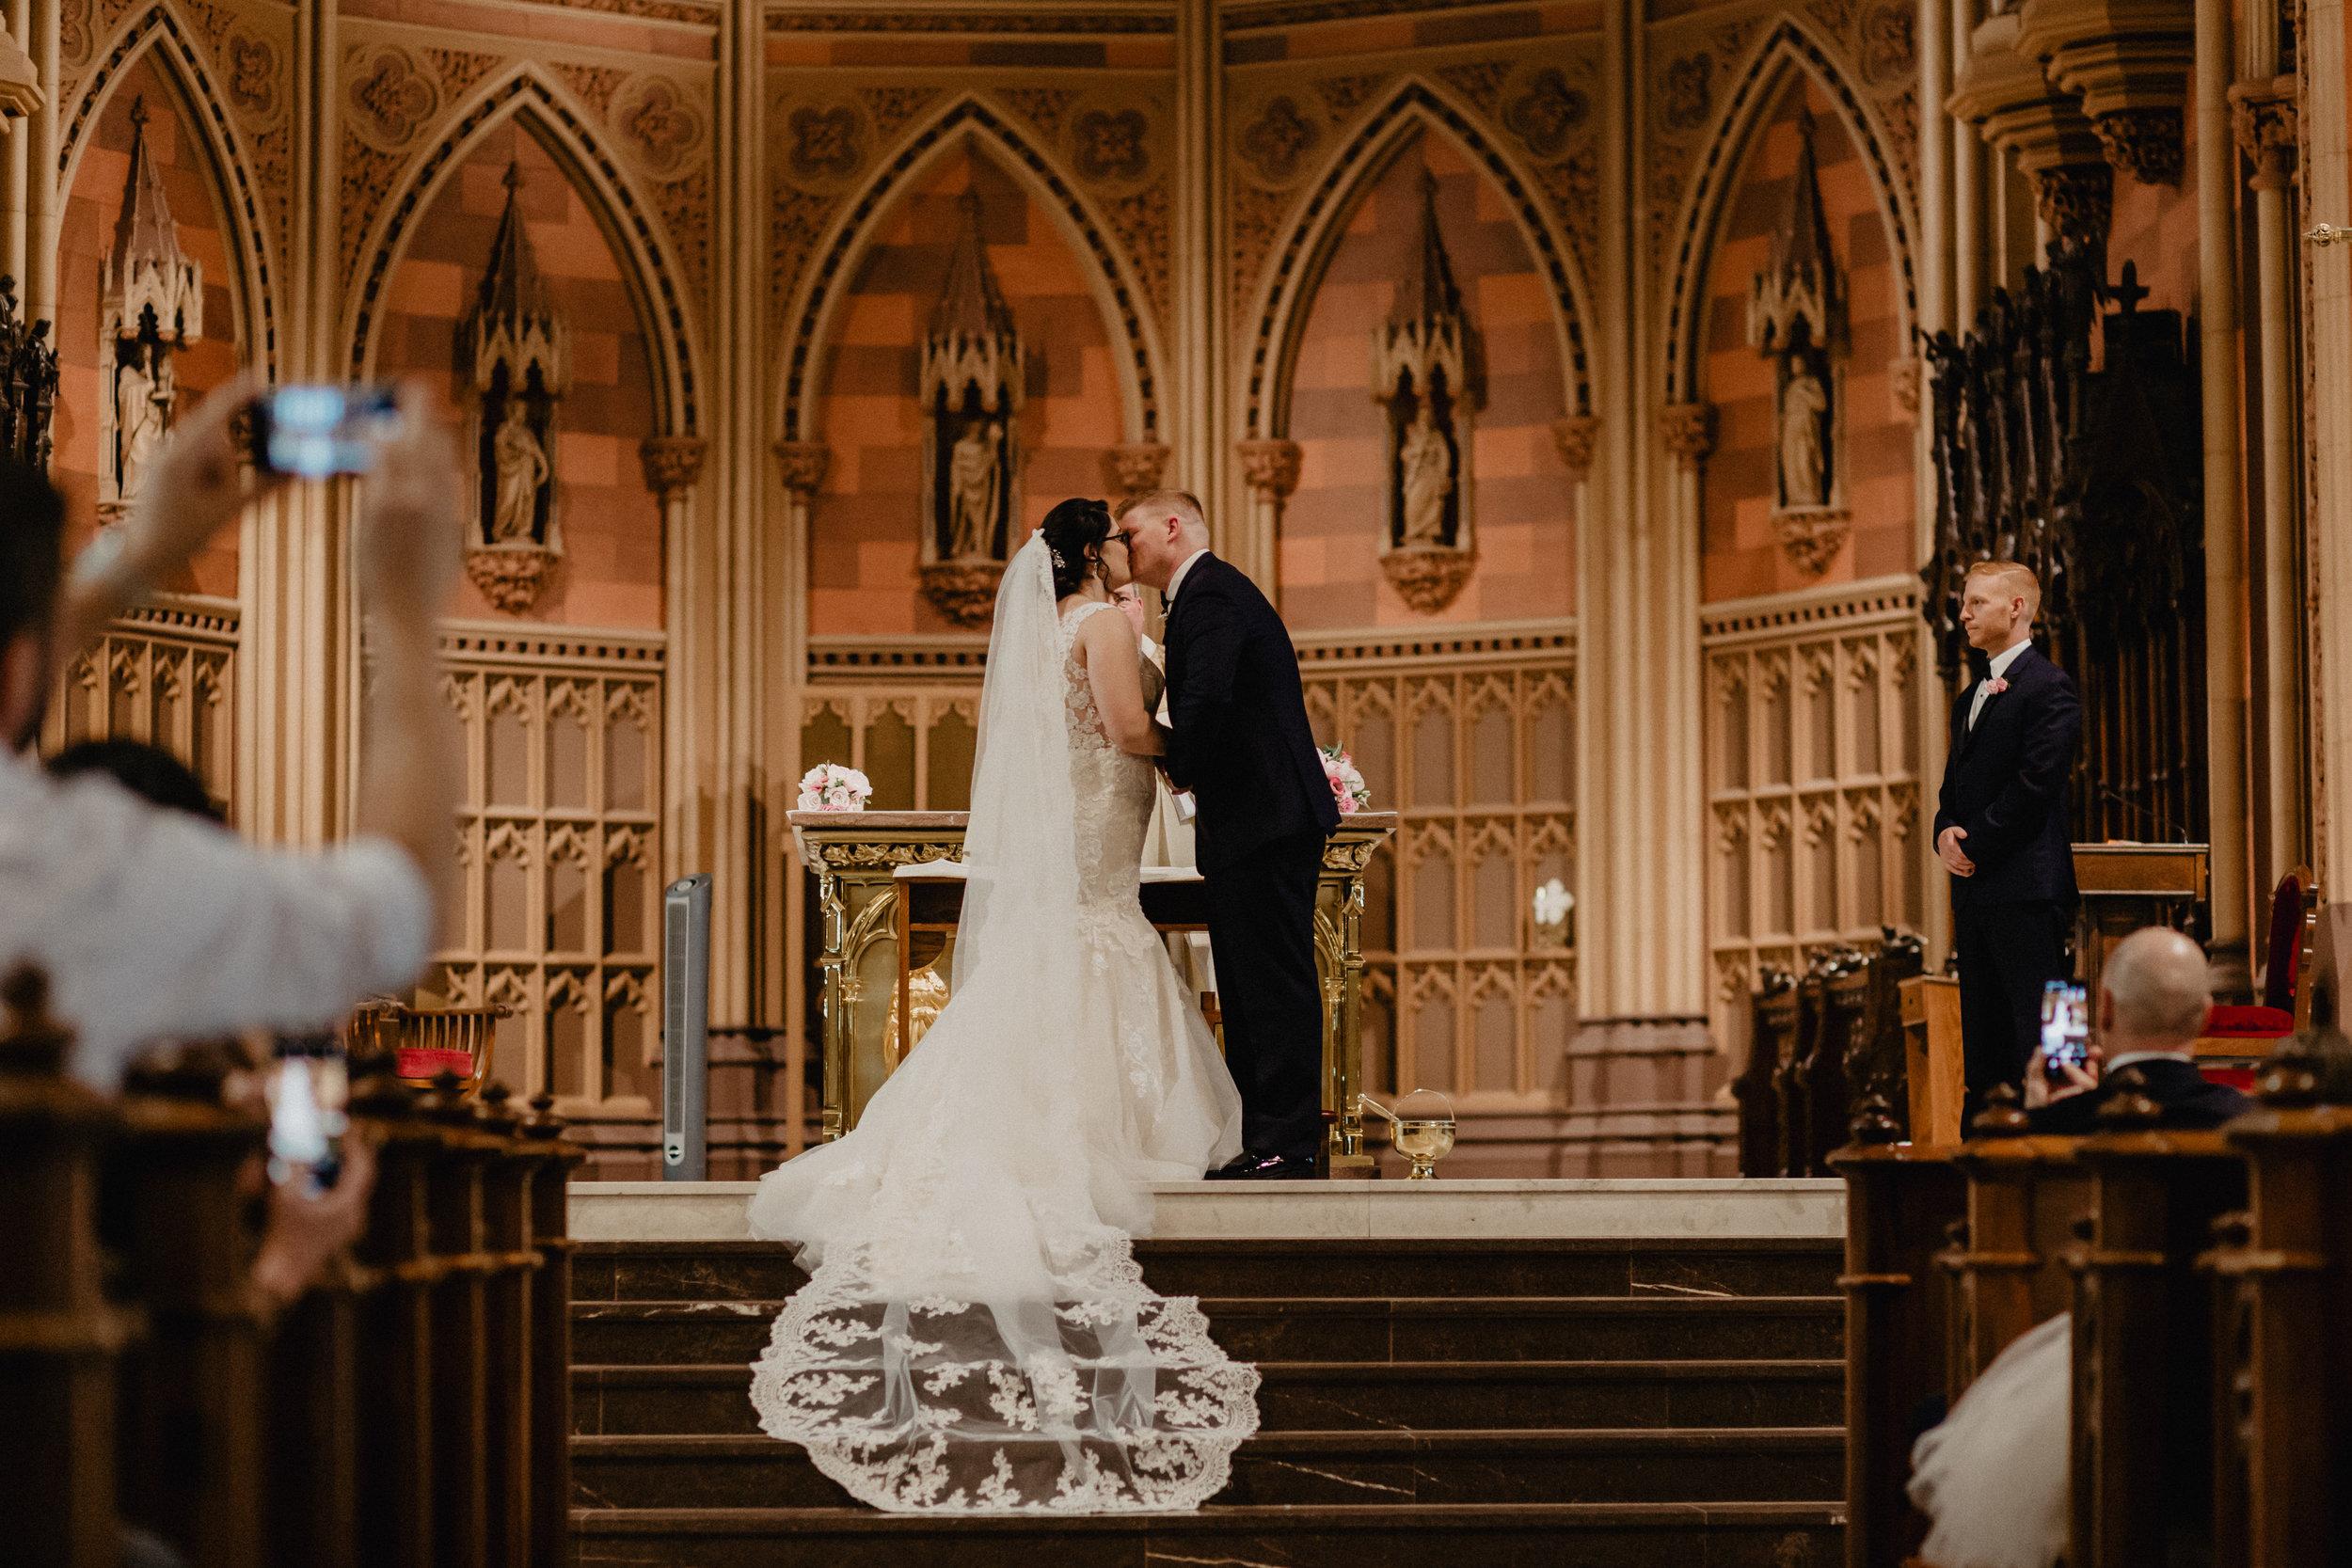 vanessa-dallas-wedding-279.jpg